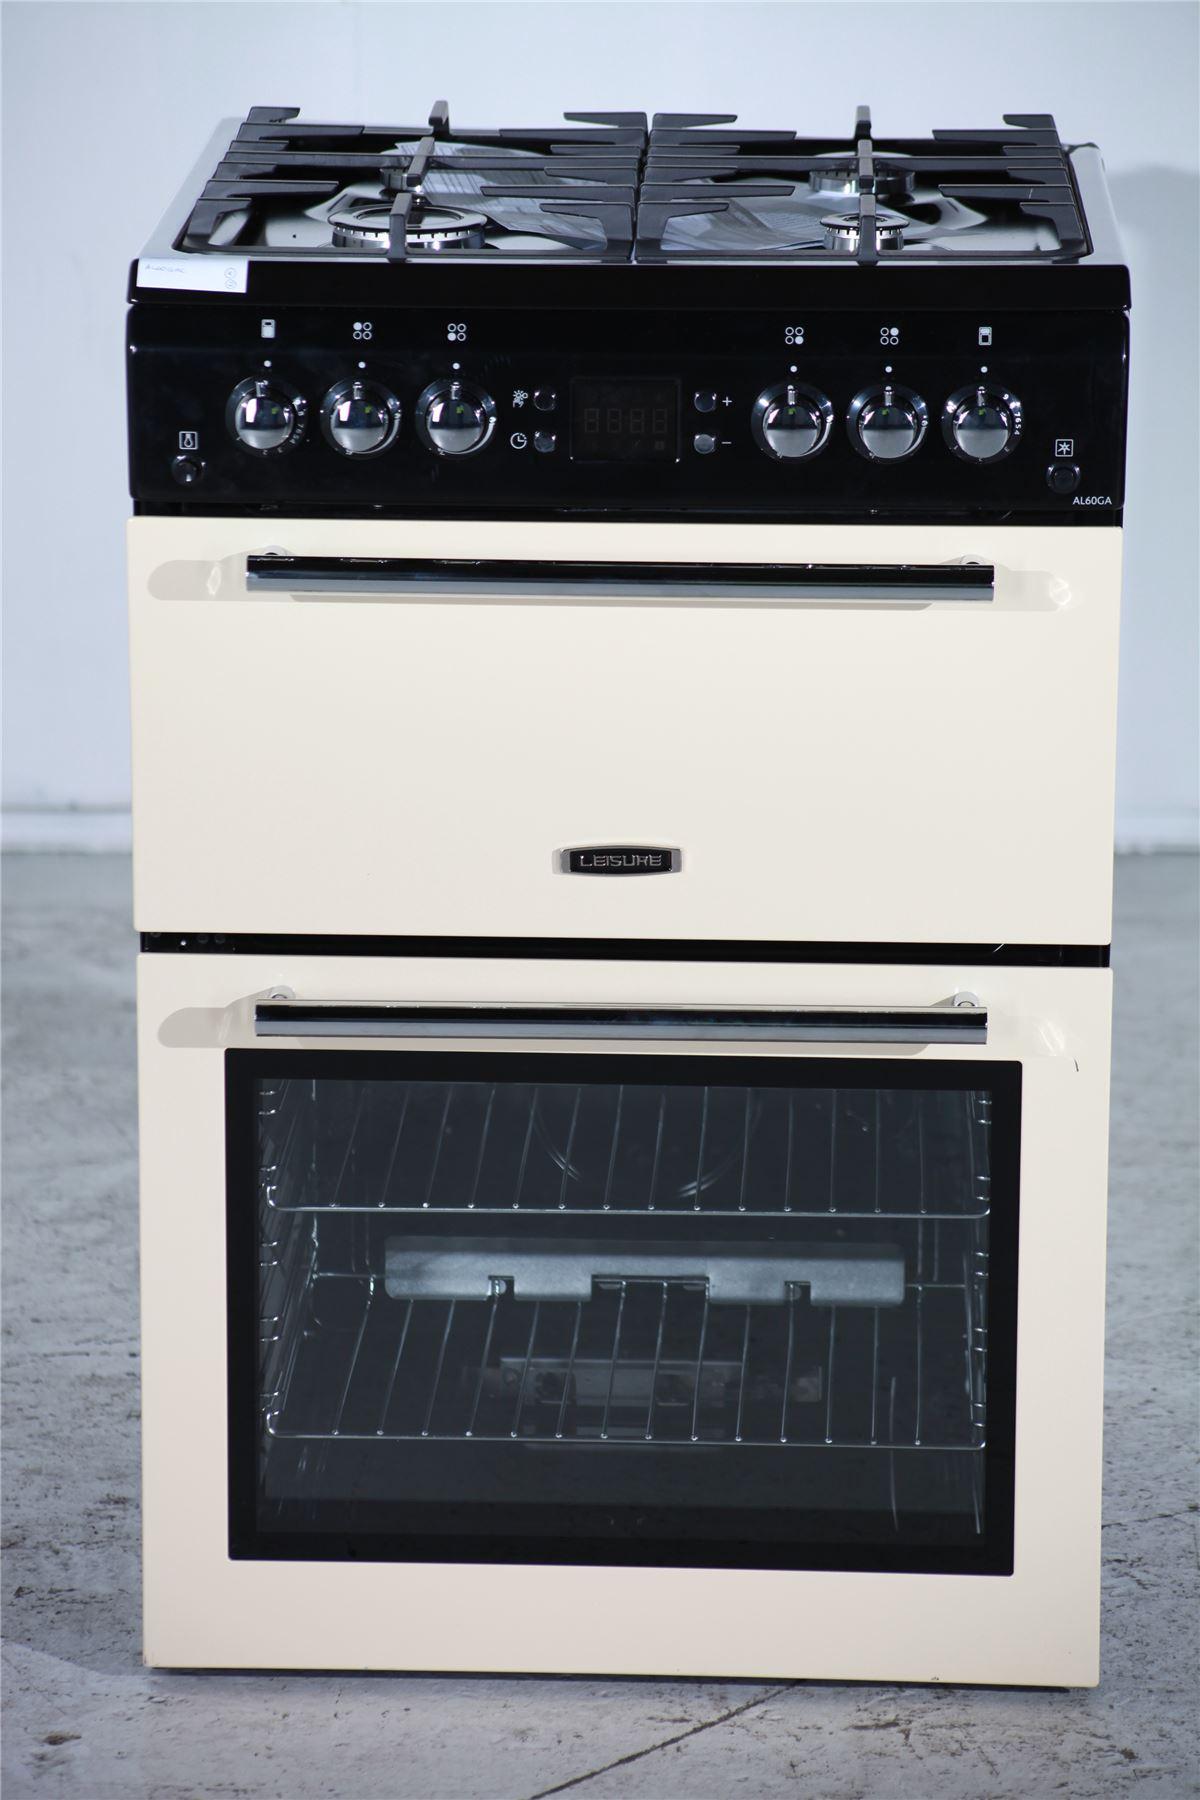 Preloved Leisure Gas Cooker Al60gac Black Amp Cream